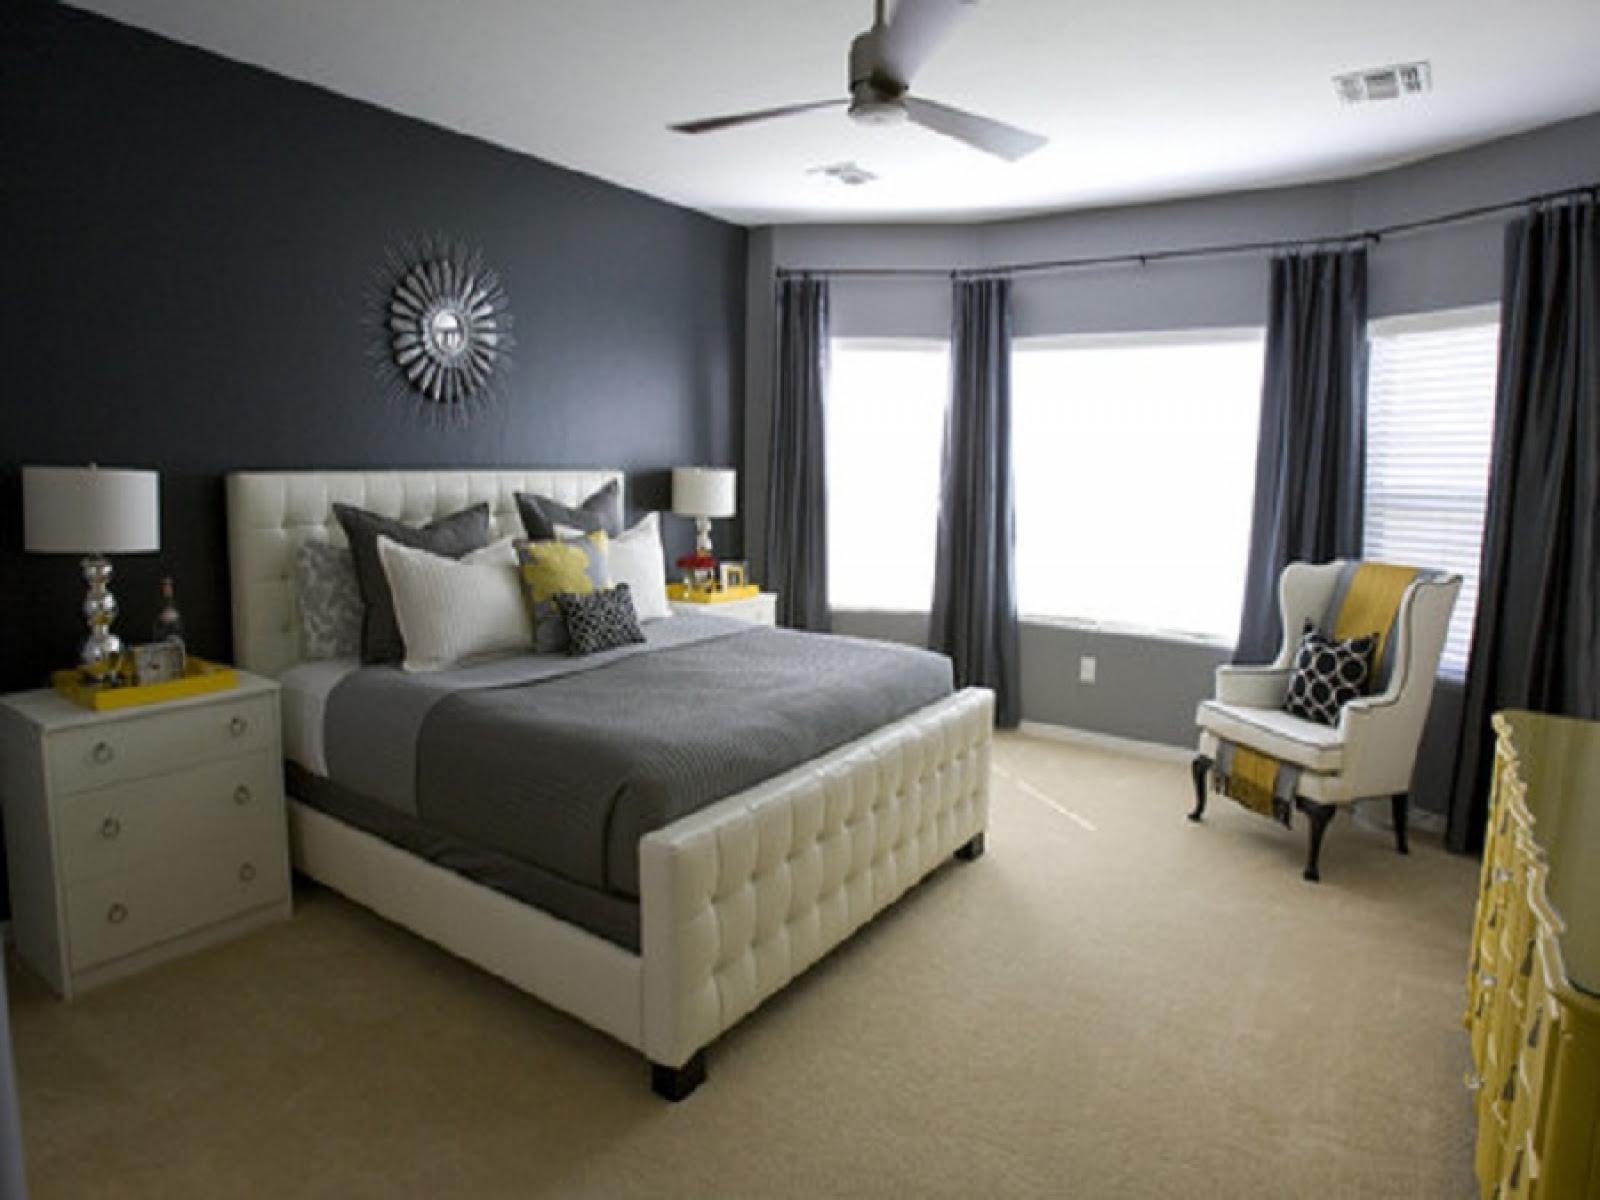 Design Ideas For Girls Bedrooms   Joy Studio Design ...